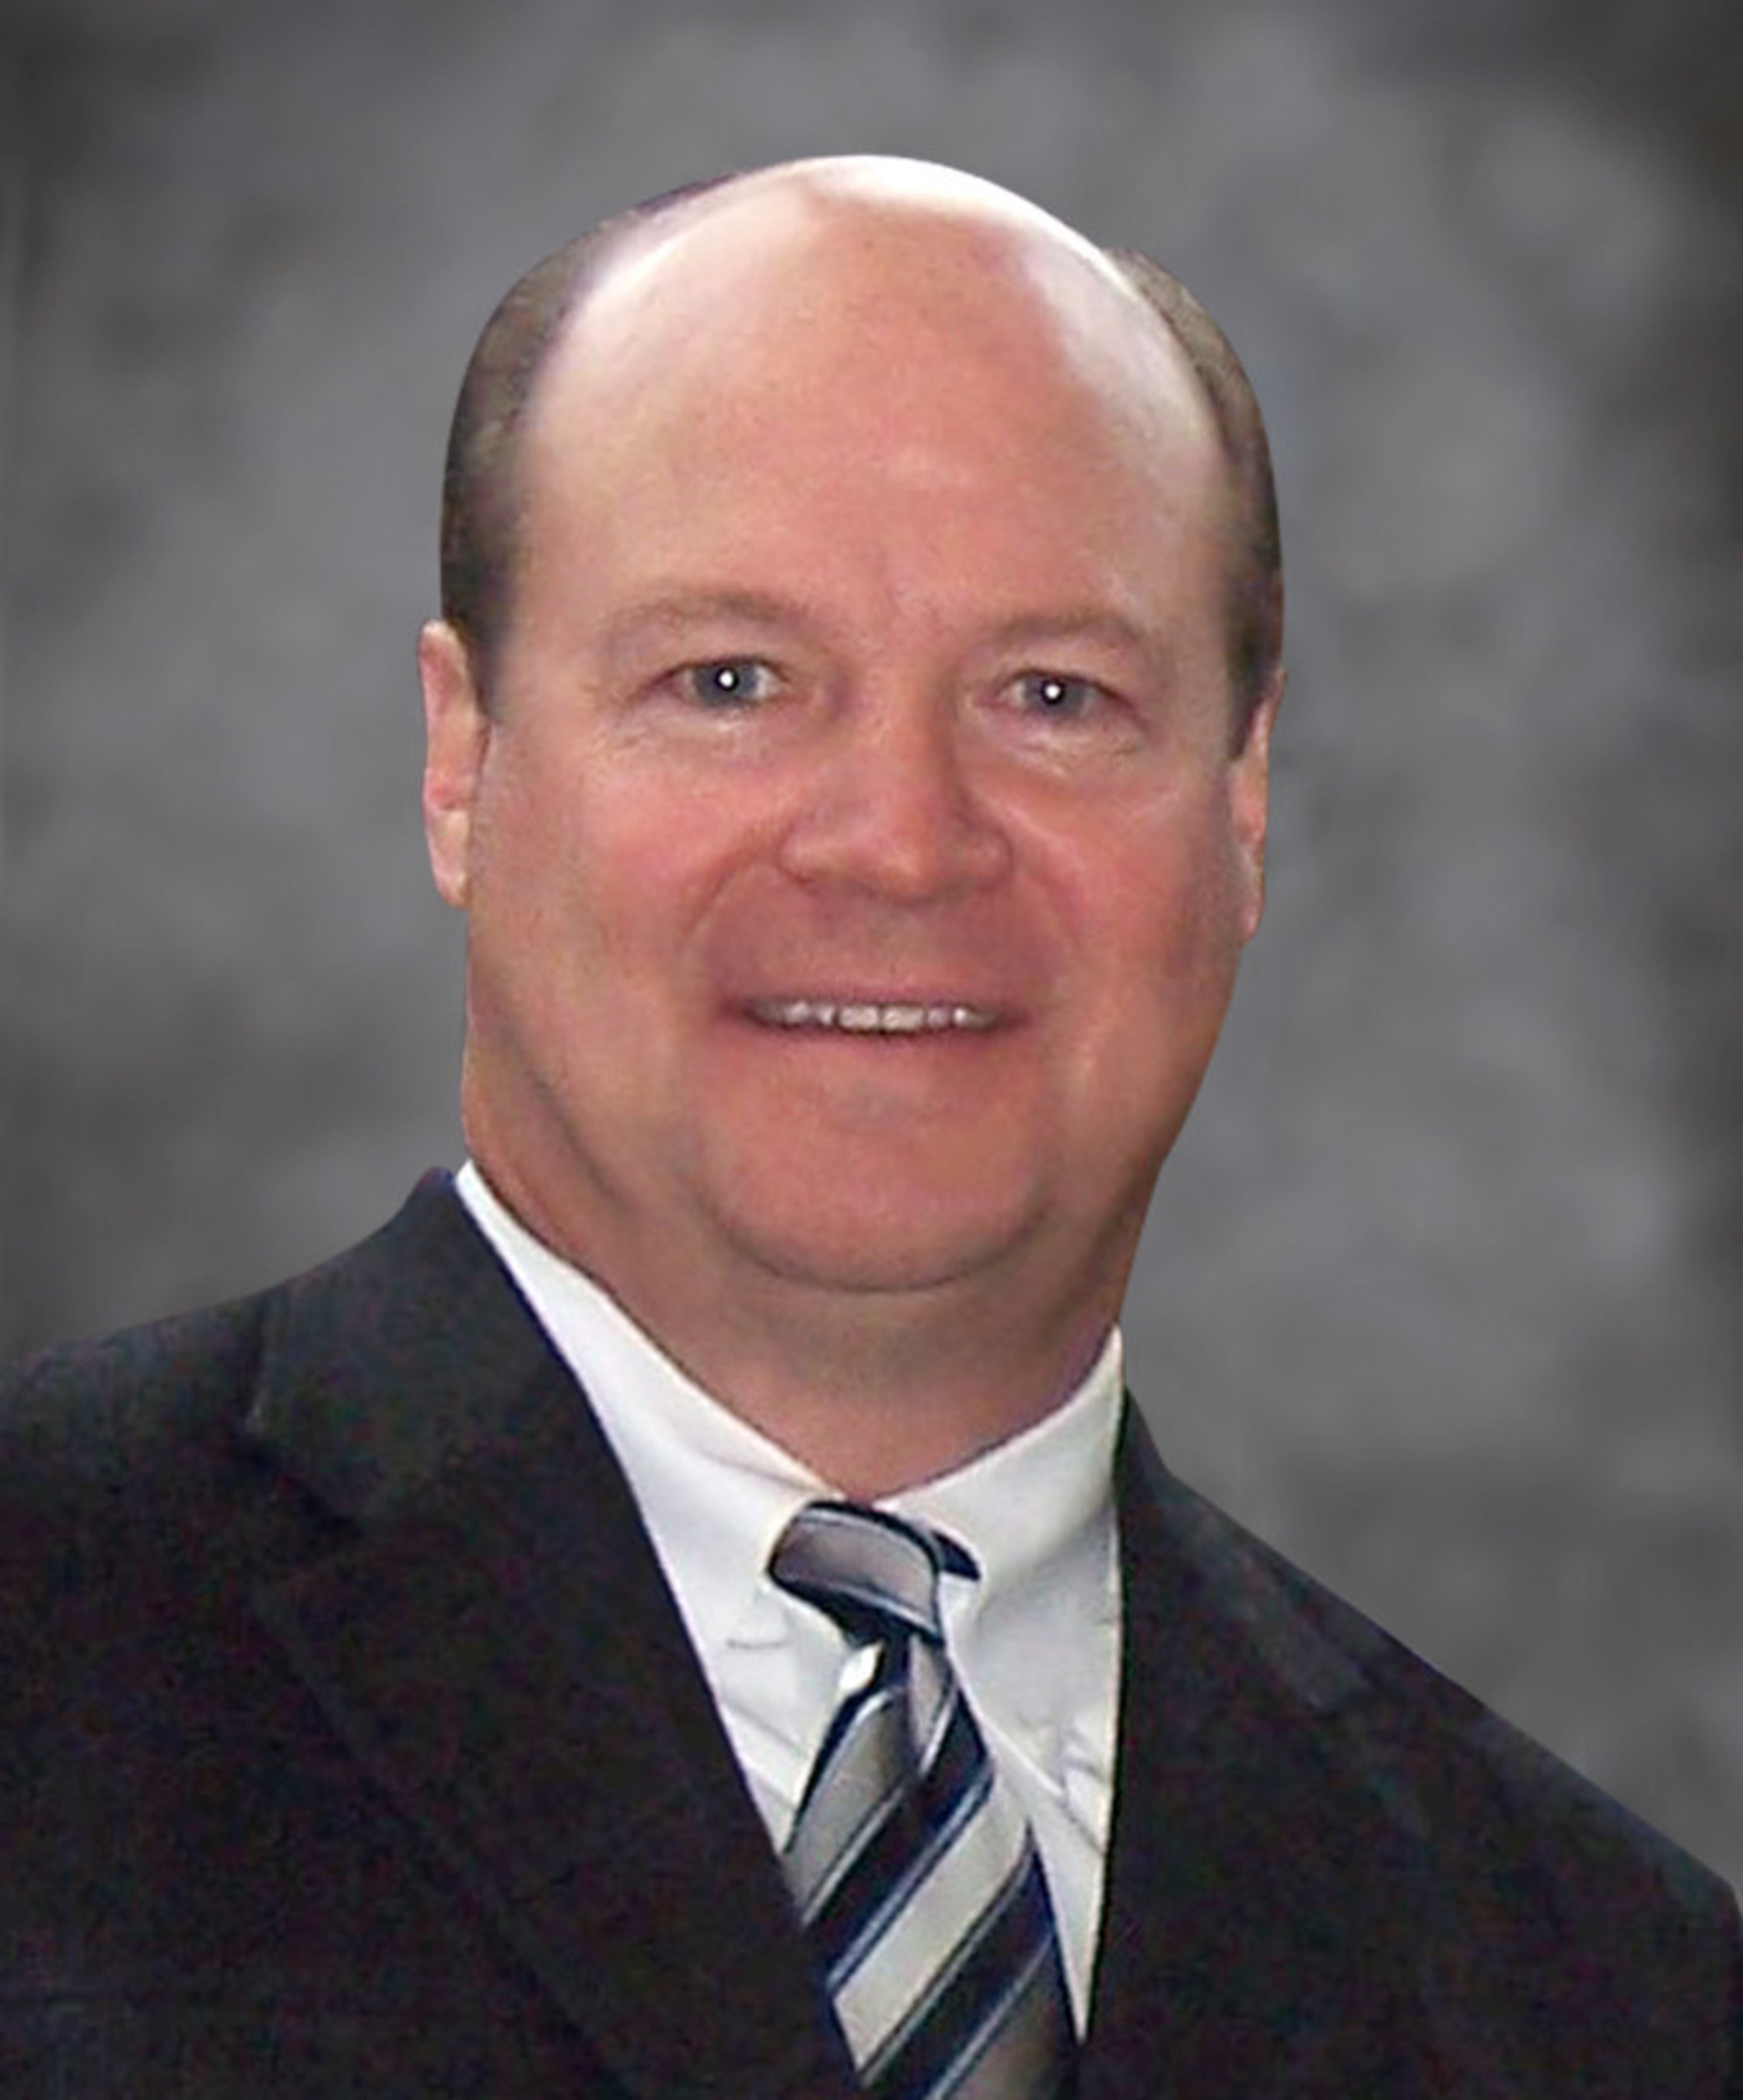 Newly appointed Huntzinger Management Group VP Marketing, Craig Kasper